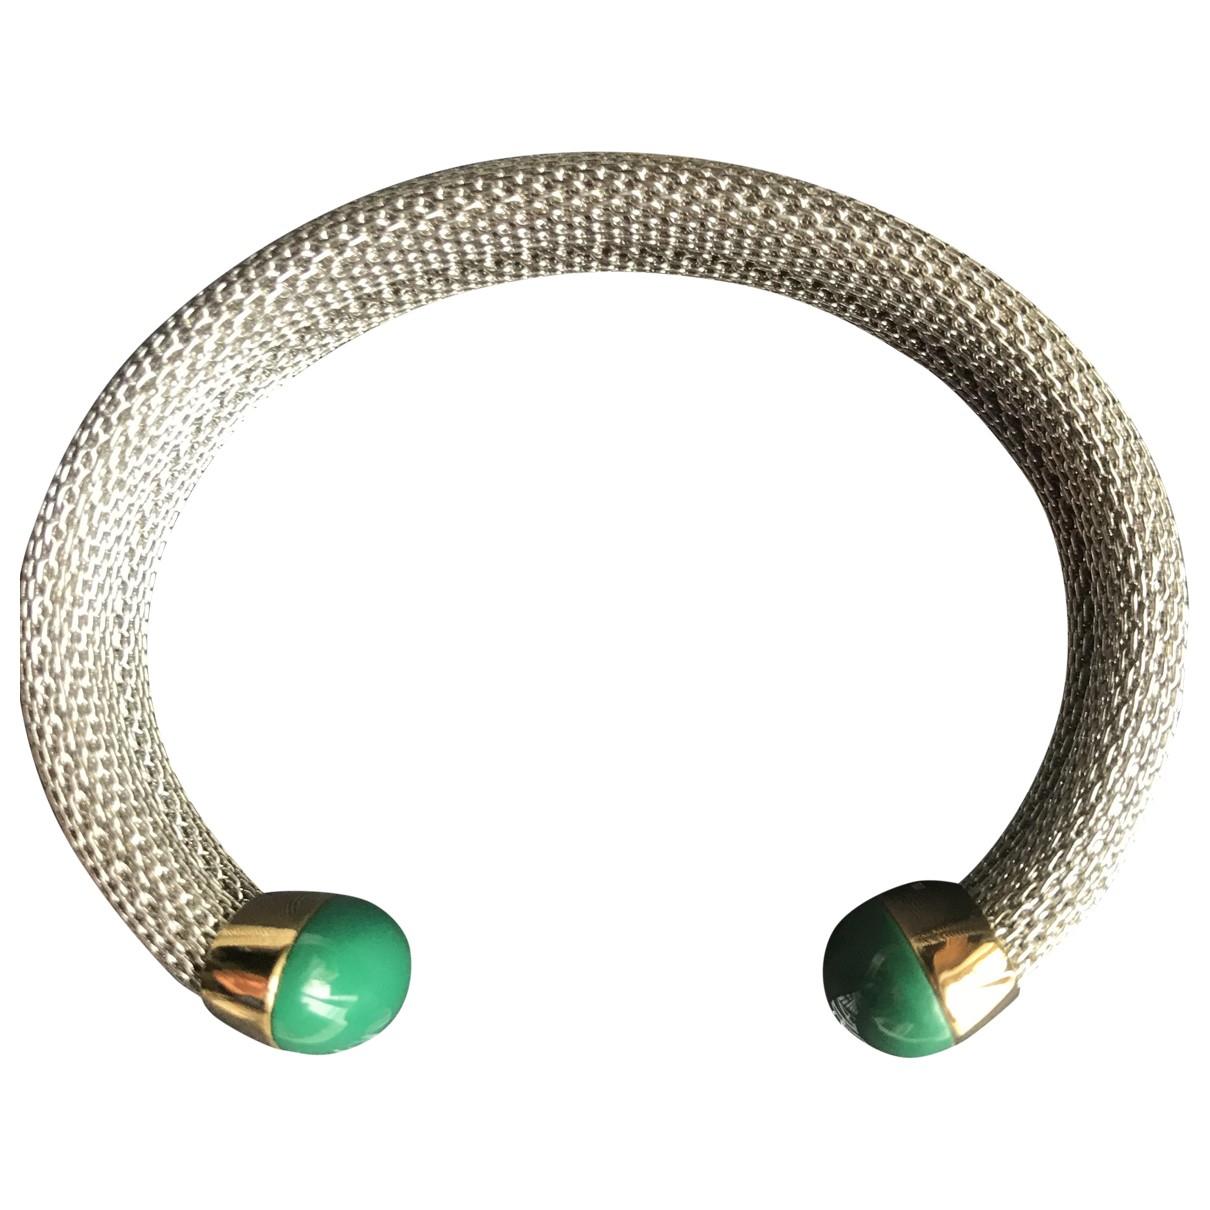 Emporio Armani \N Armband in  Gruen Silber